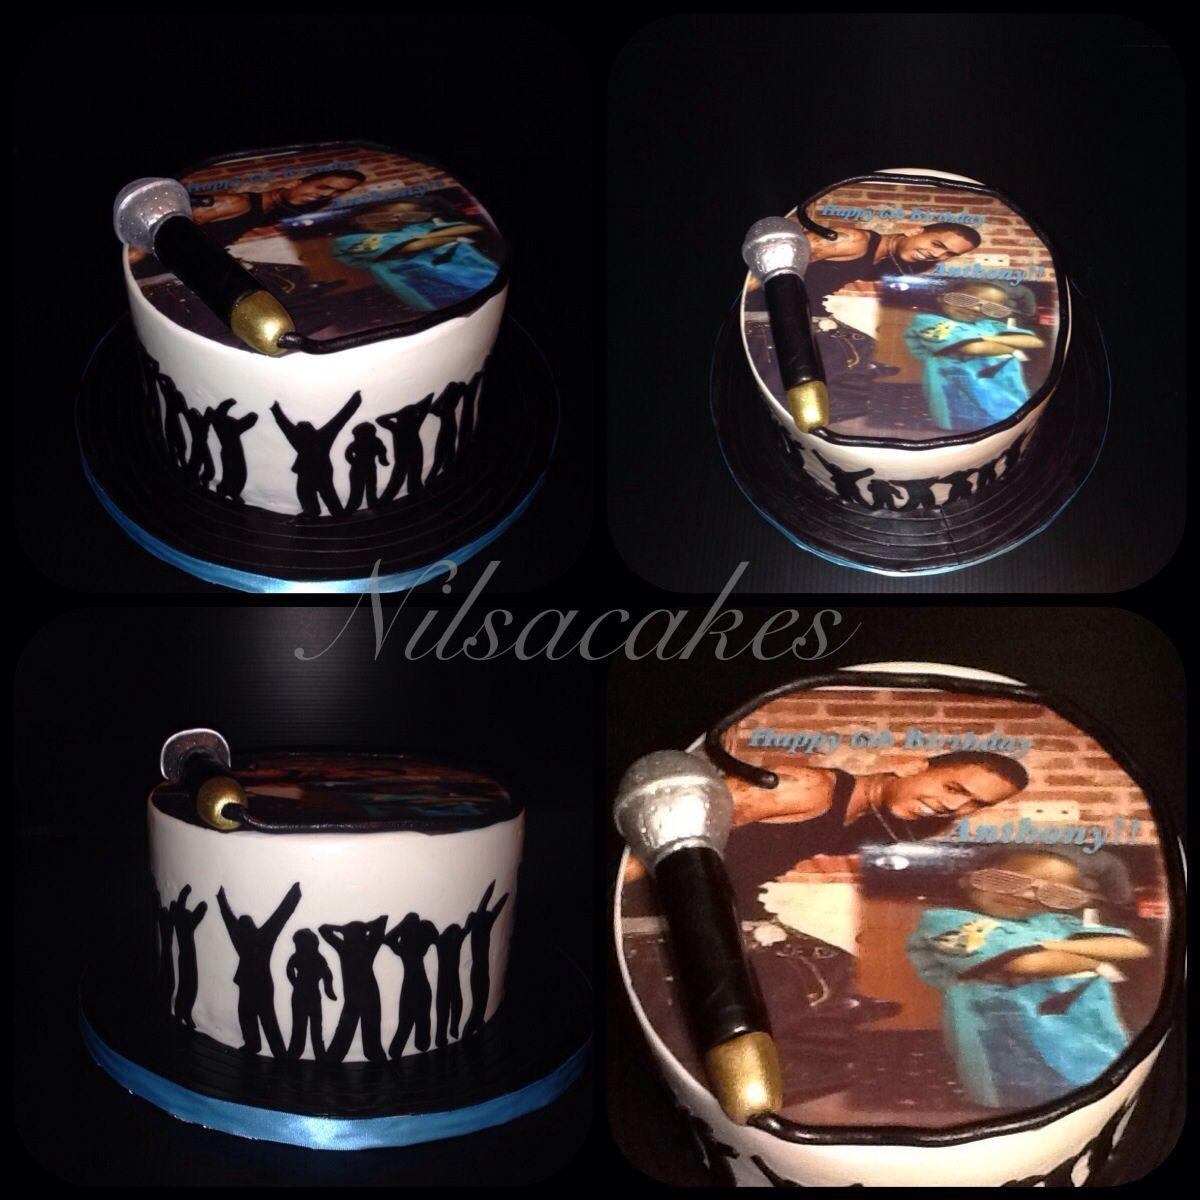 Chris Brown Cake Mojees Cakes Pinterest Chris Brown Cake And